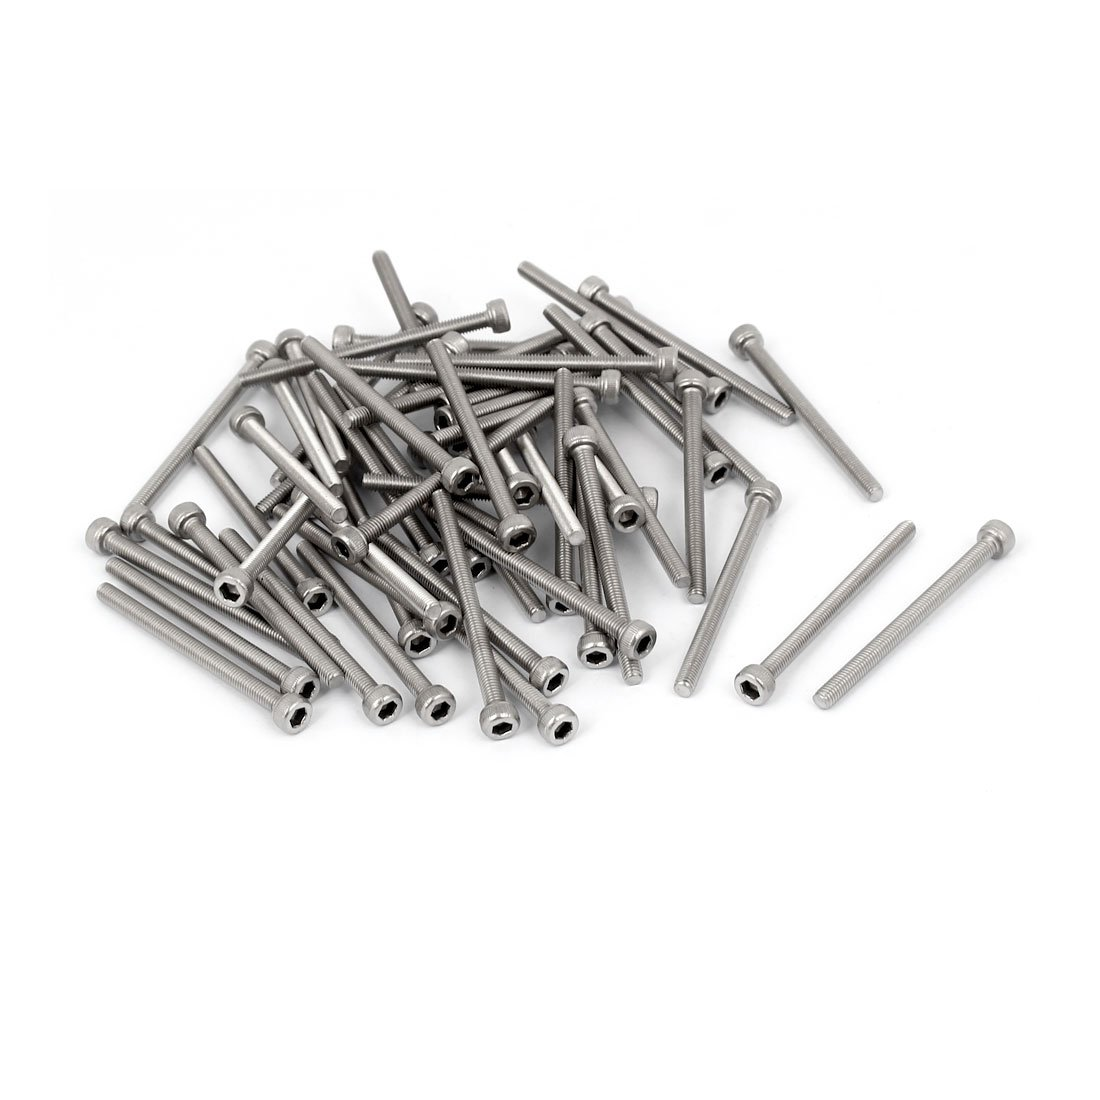 uxcell M3x40mm Thread 304 Stainless Steel Hex Socket Head Cap Screw Bolt DIN912 55pcs a16080900ux0219